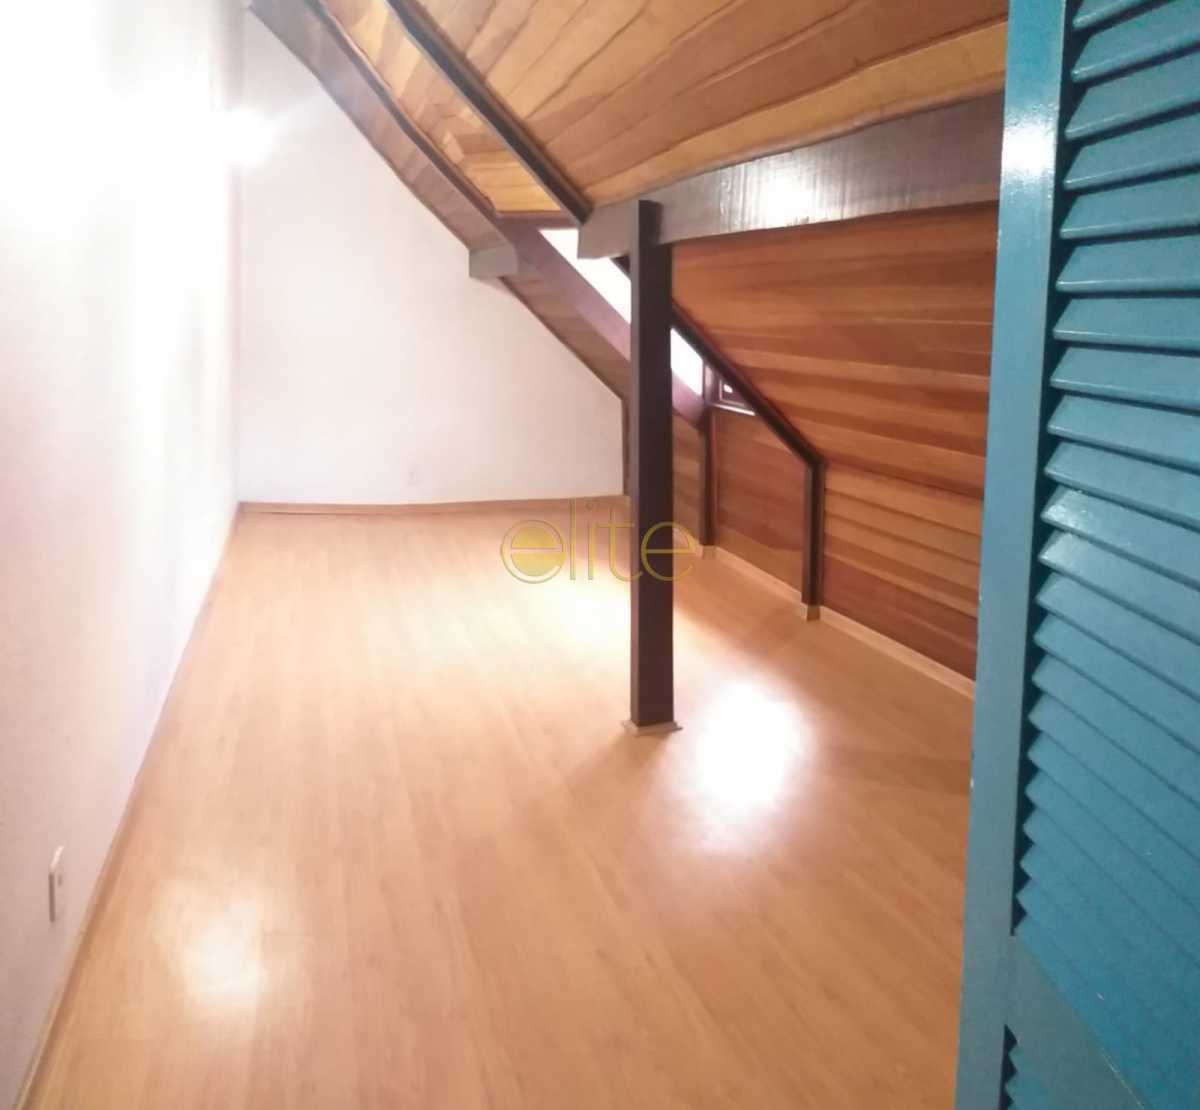 WhatsApp Image 2021-08-05 at 1 - Casa 5 quartos à venda Barra da Tijuca, Barra da Tijuca,Rio de Janeiro - R$ 2.700.000 - EBCA50010 - 23